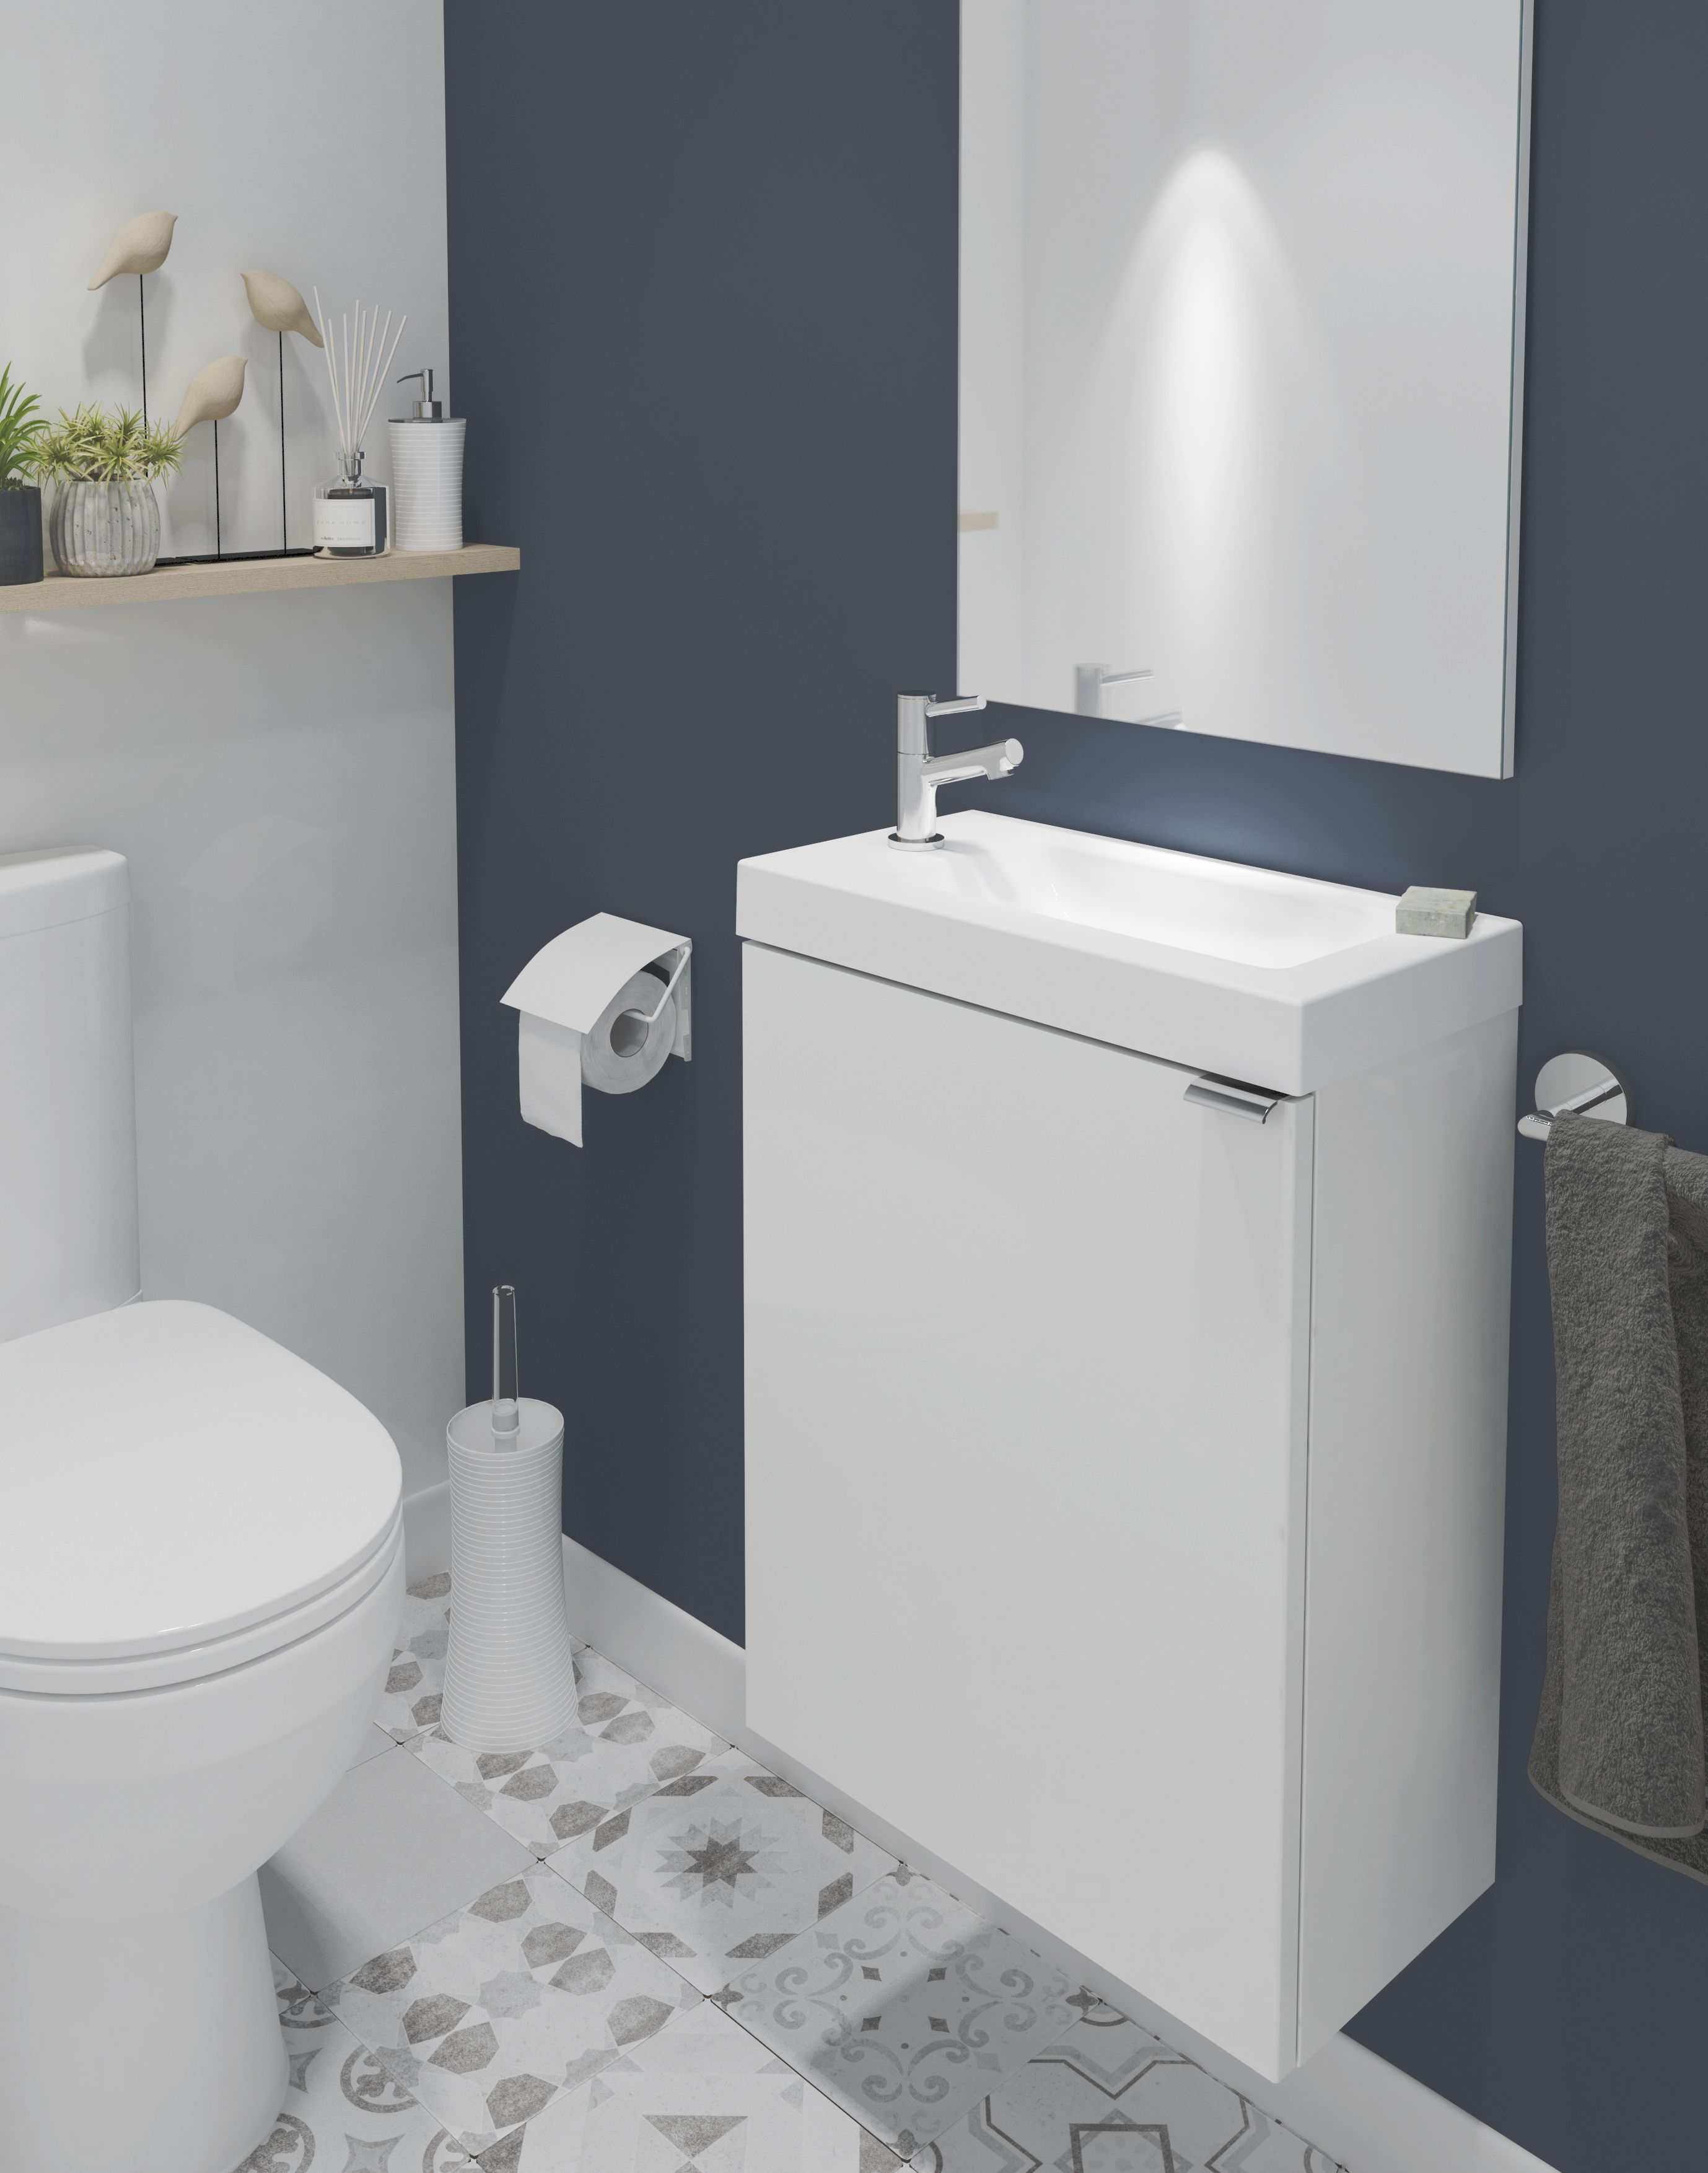 40+ Wall mounted bathroom cabinets bq inspiration